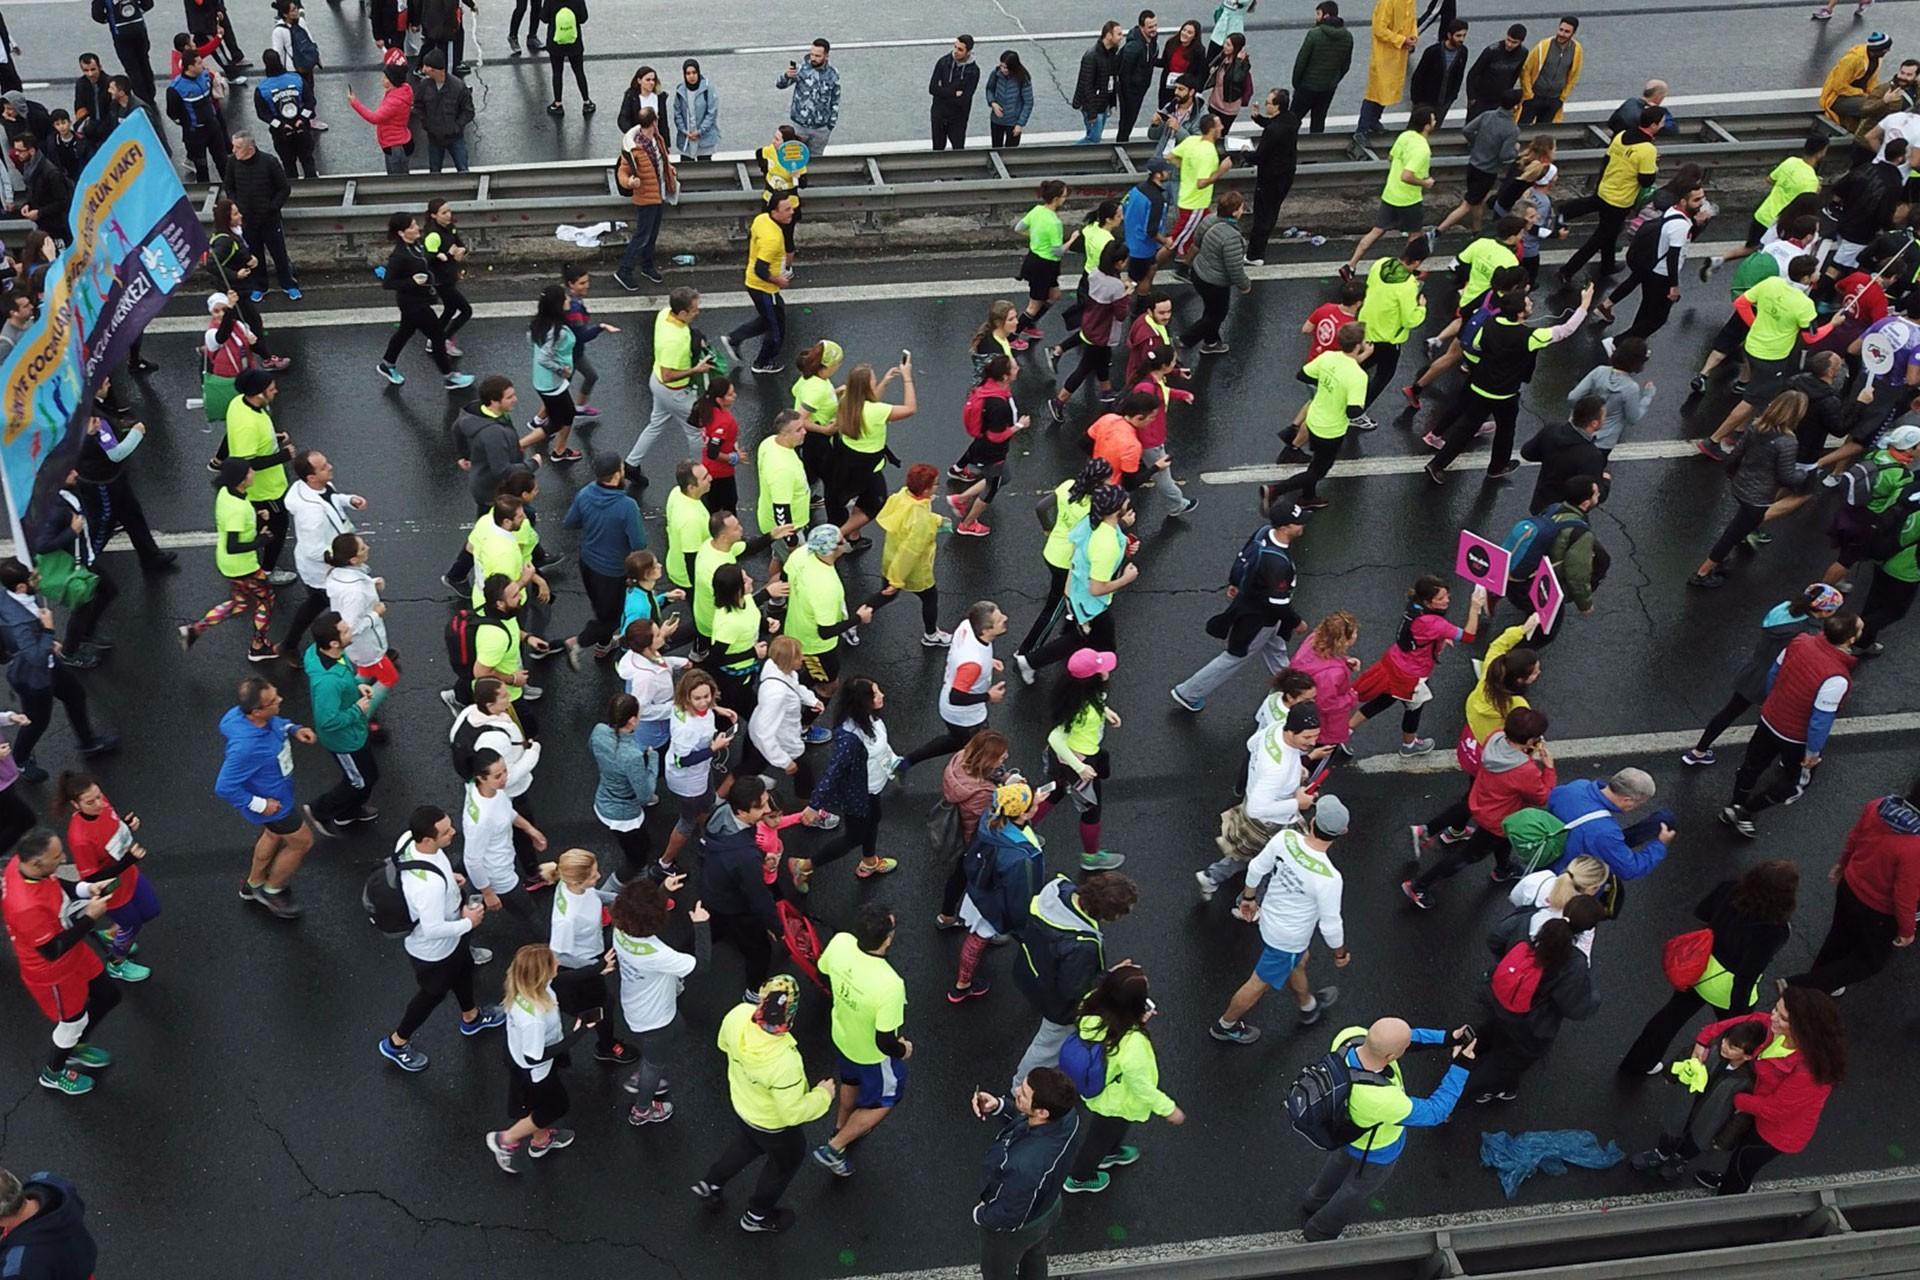 TGS, İstanbul Maratonu'nda tutuklu gazeteciler için koşacak